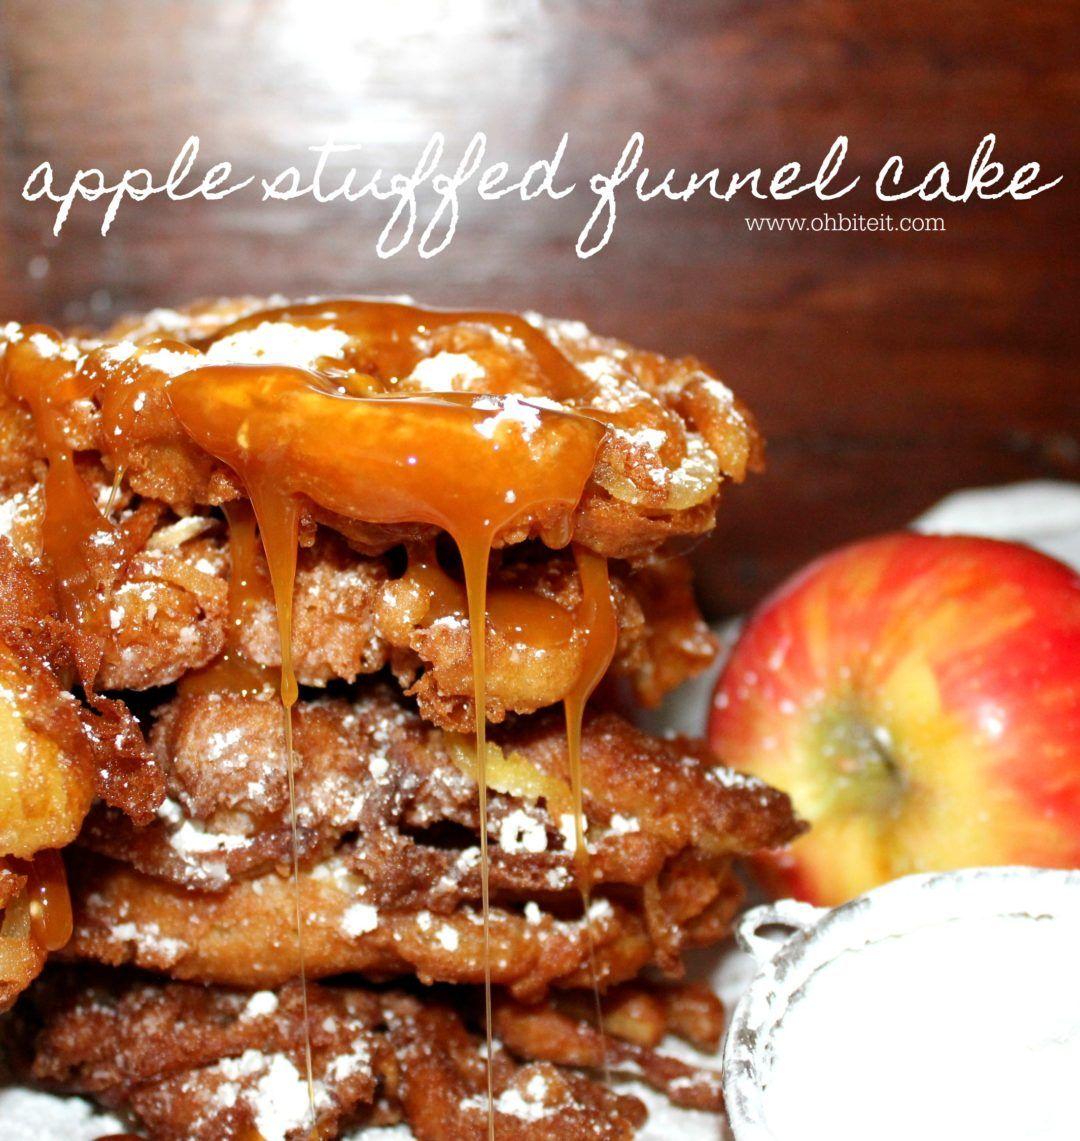 Apple stuffed funnel cake oh bite it funnel cake